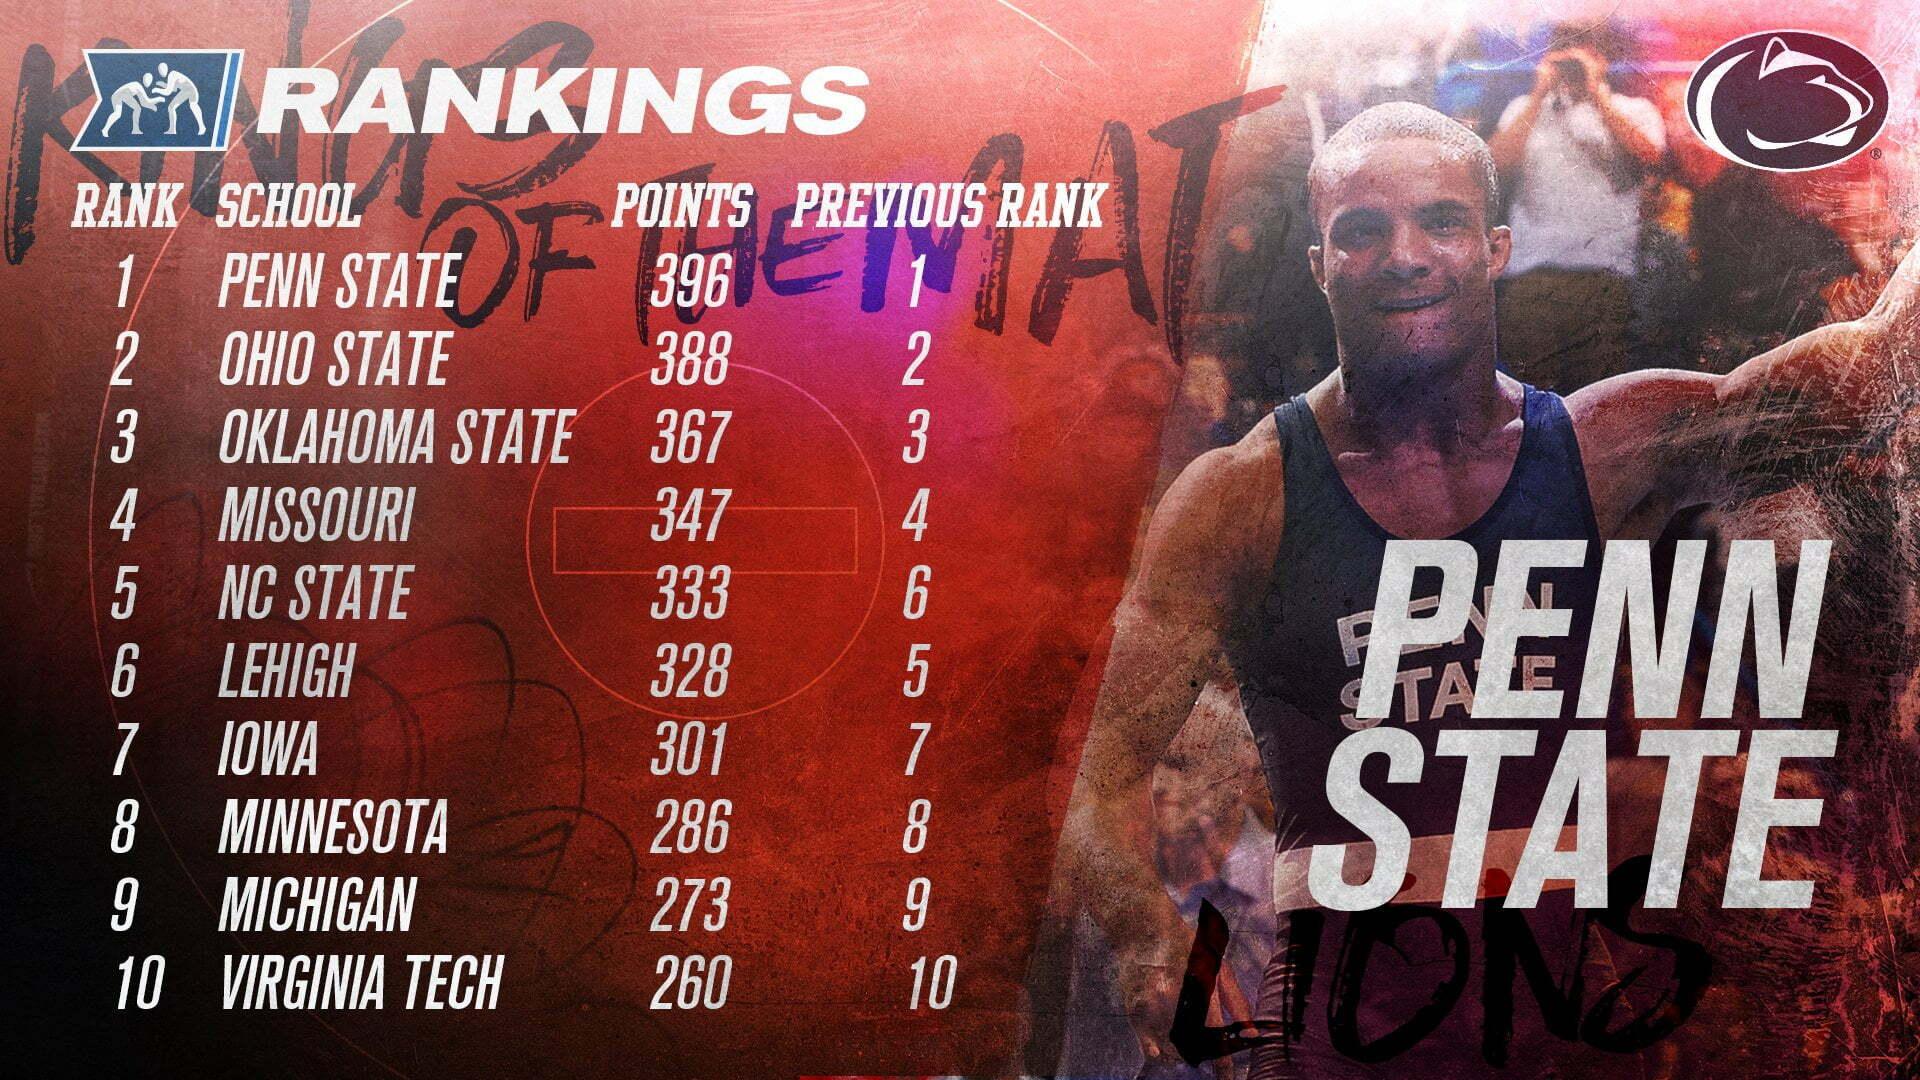 NCAA Rankings